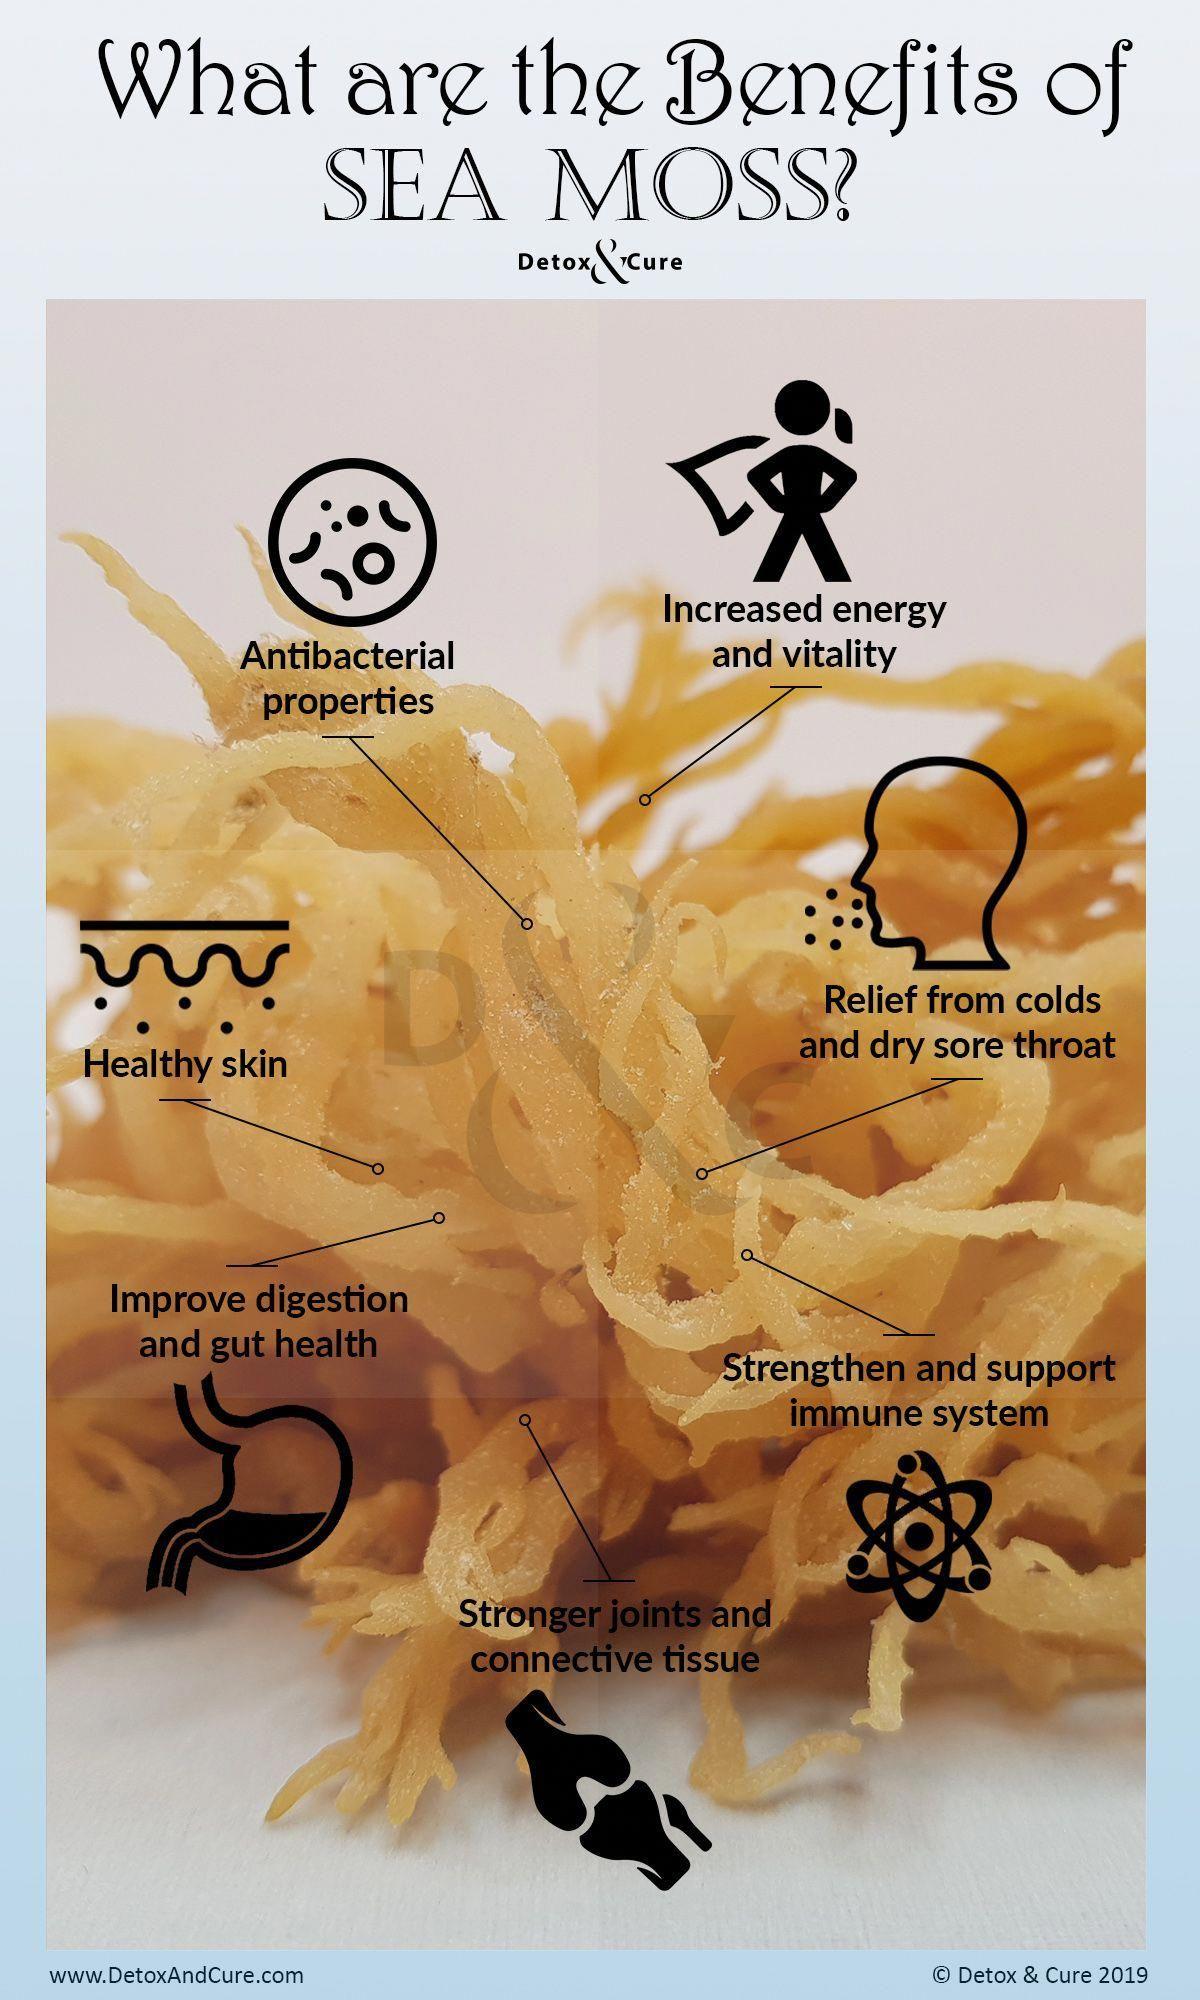 Goodness of seaweed in 2020 sea moss moss seamoss benefits